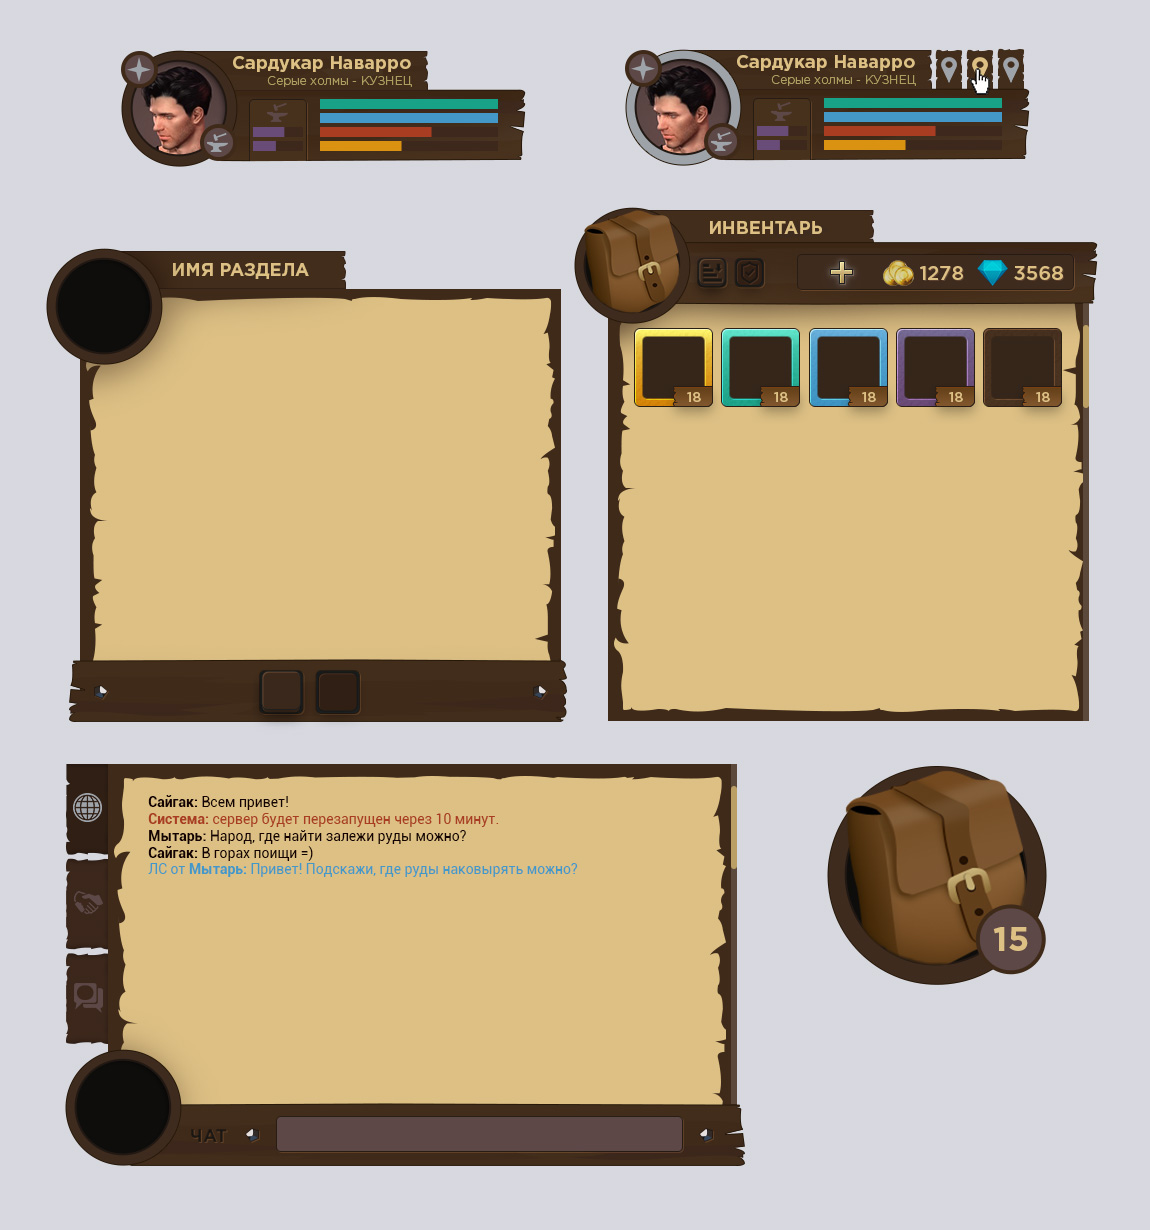 UI для браузерной RPG игры